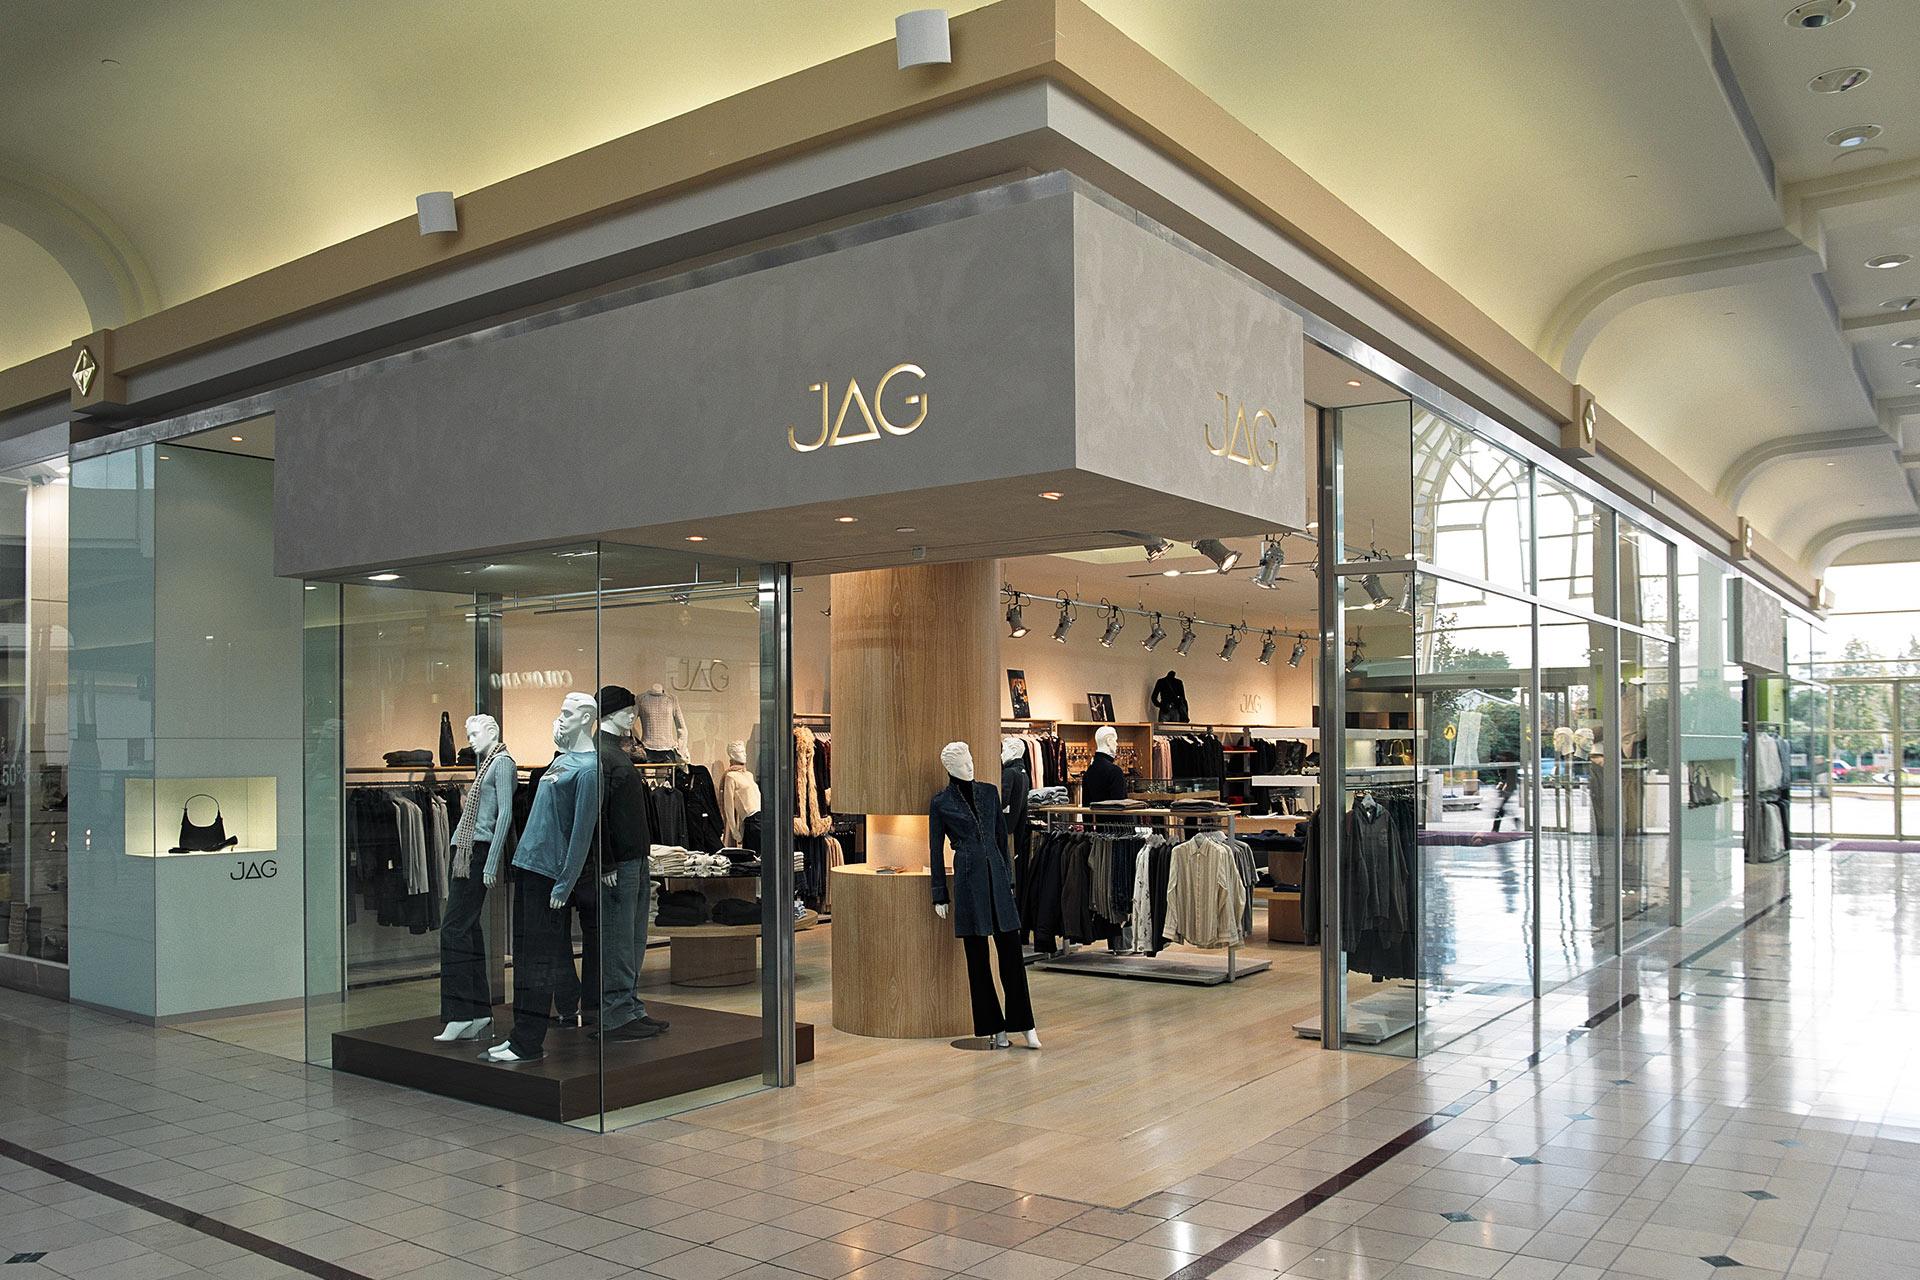 https://jamarchitects.com.au/wp-content/uploads/2021/07/JAM-Projects-Jag02-1920x1280-1.jpg